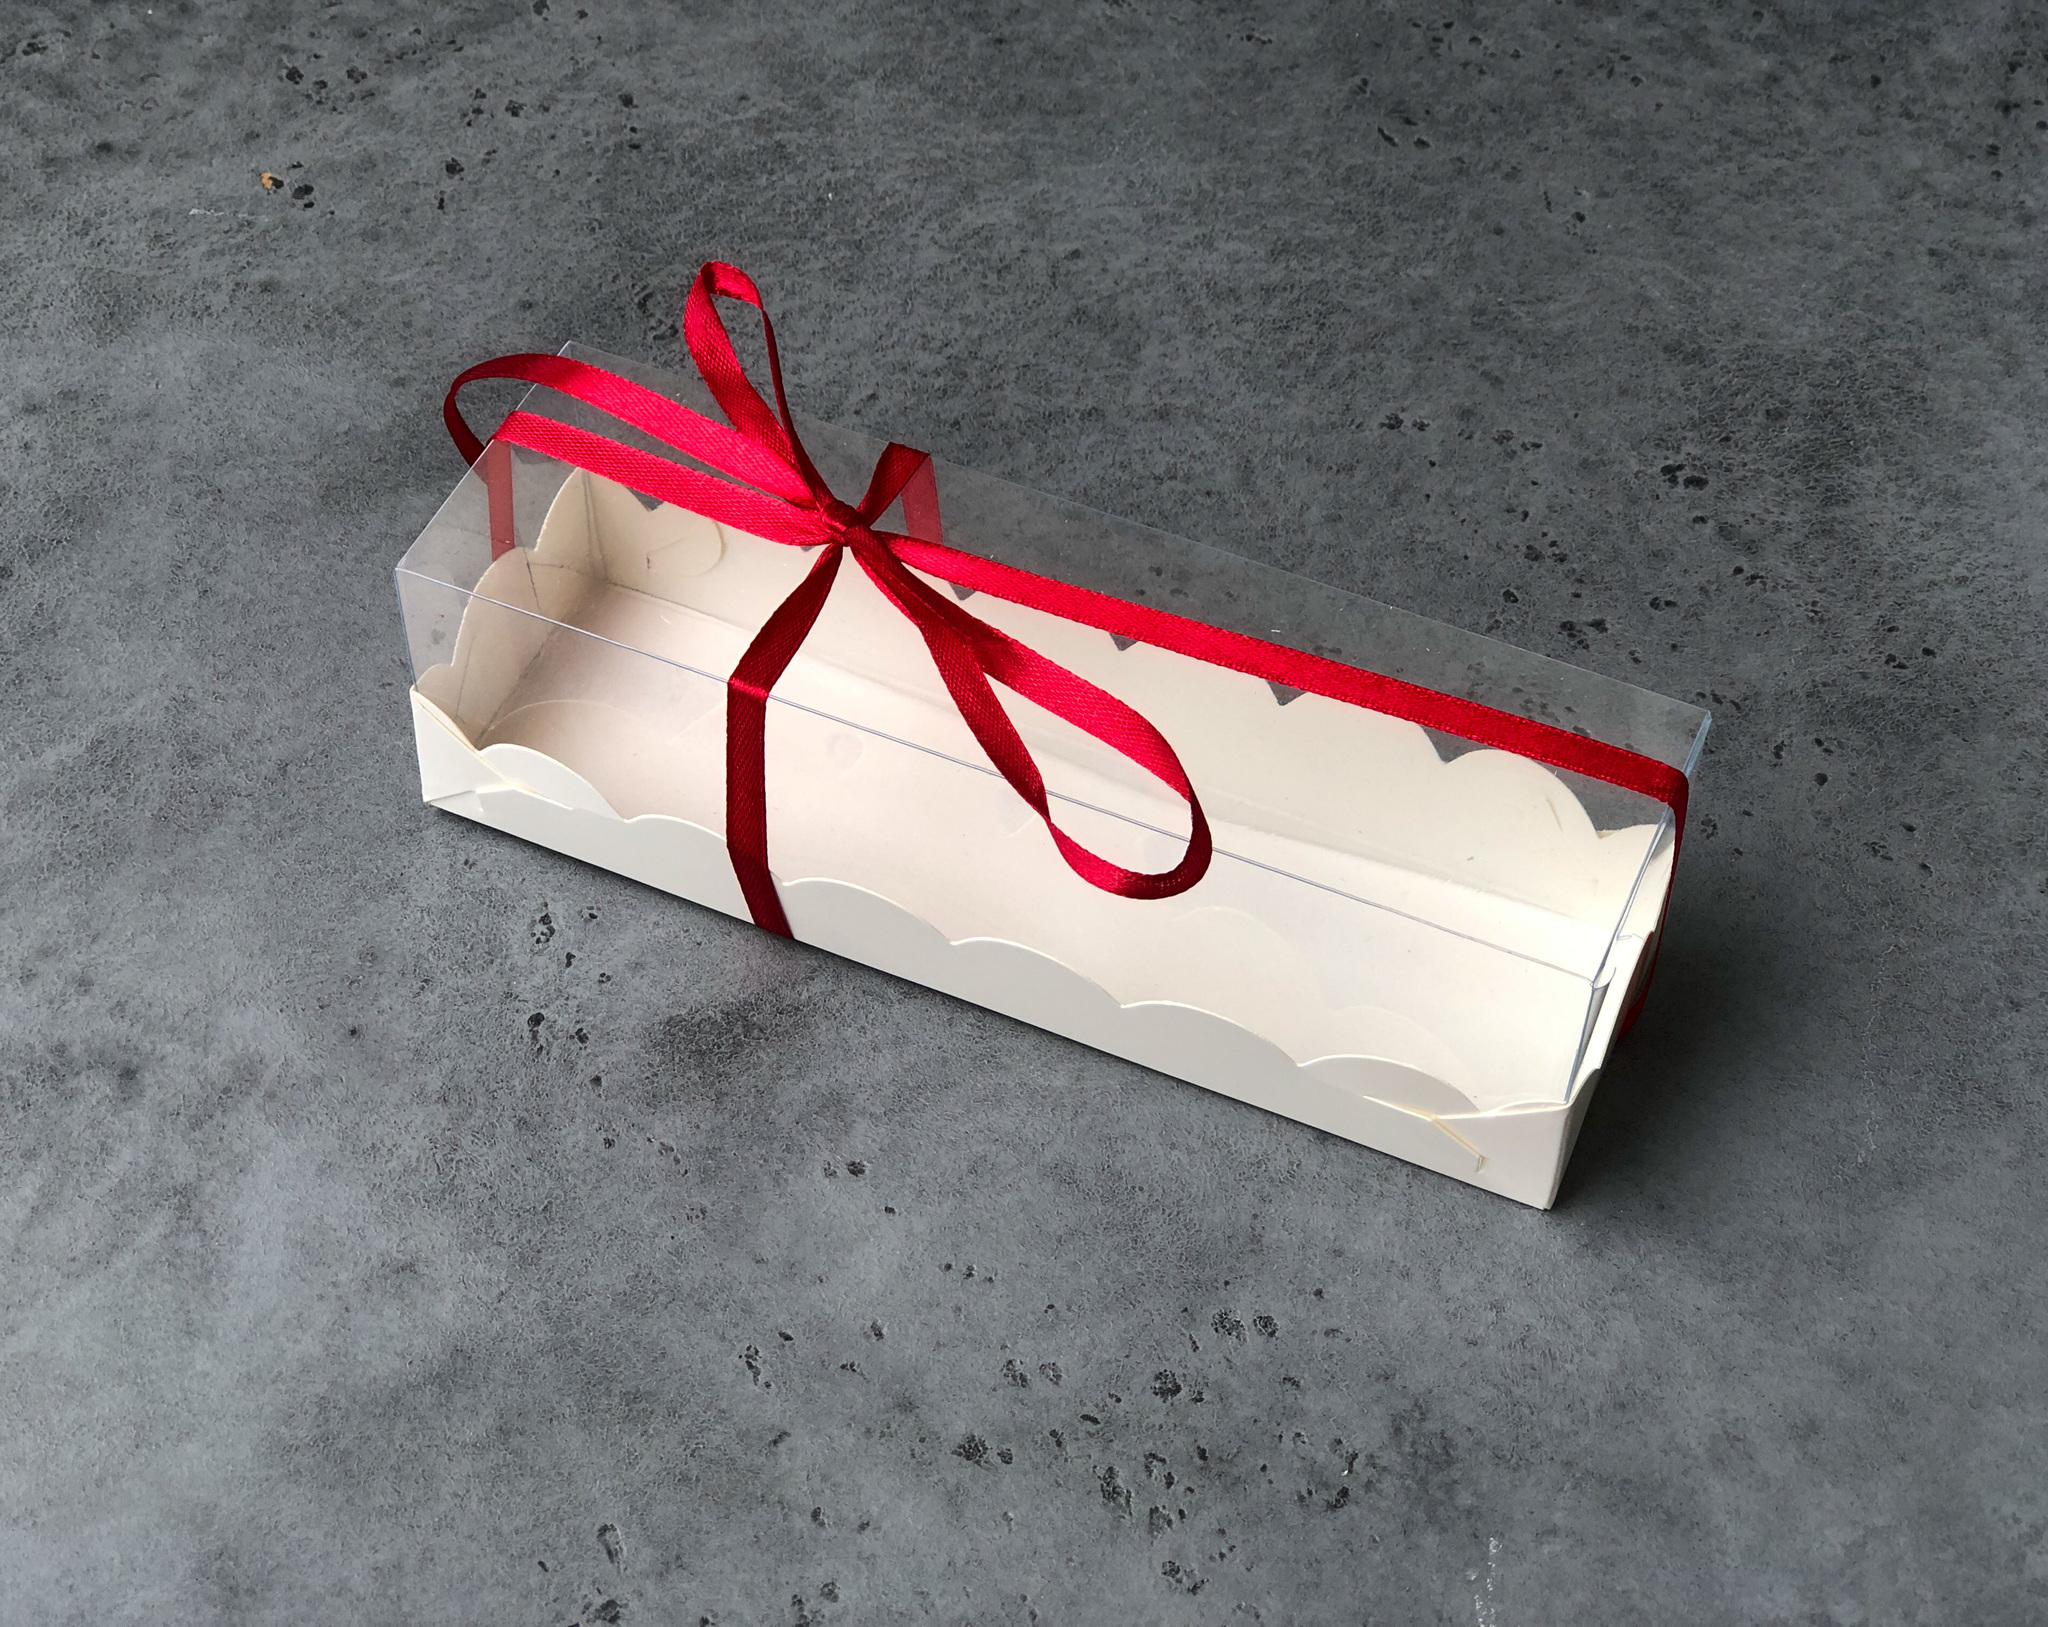 Коробка БЕЛАЯ для макаронс с пластиковой крышкой, 190х55х55 мм